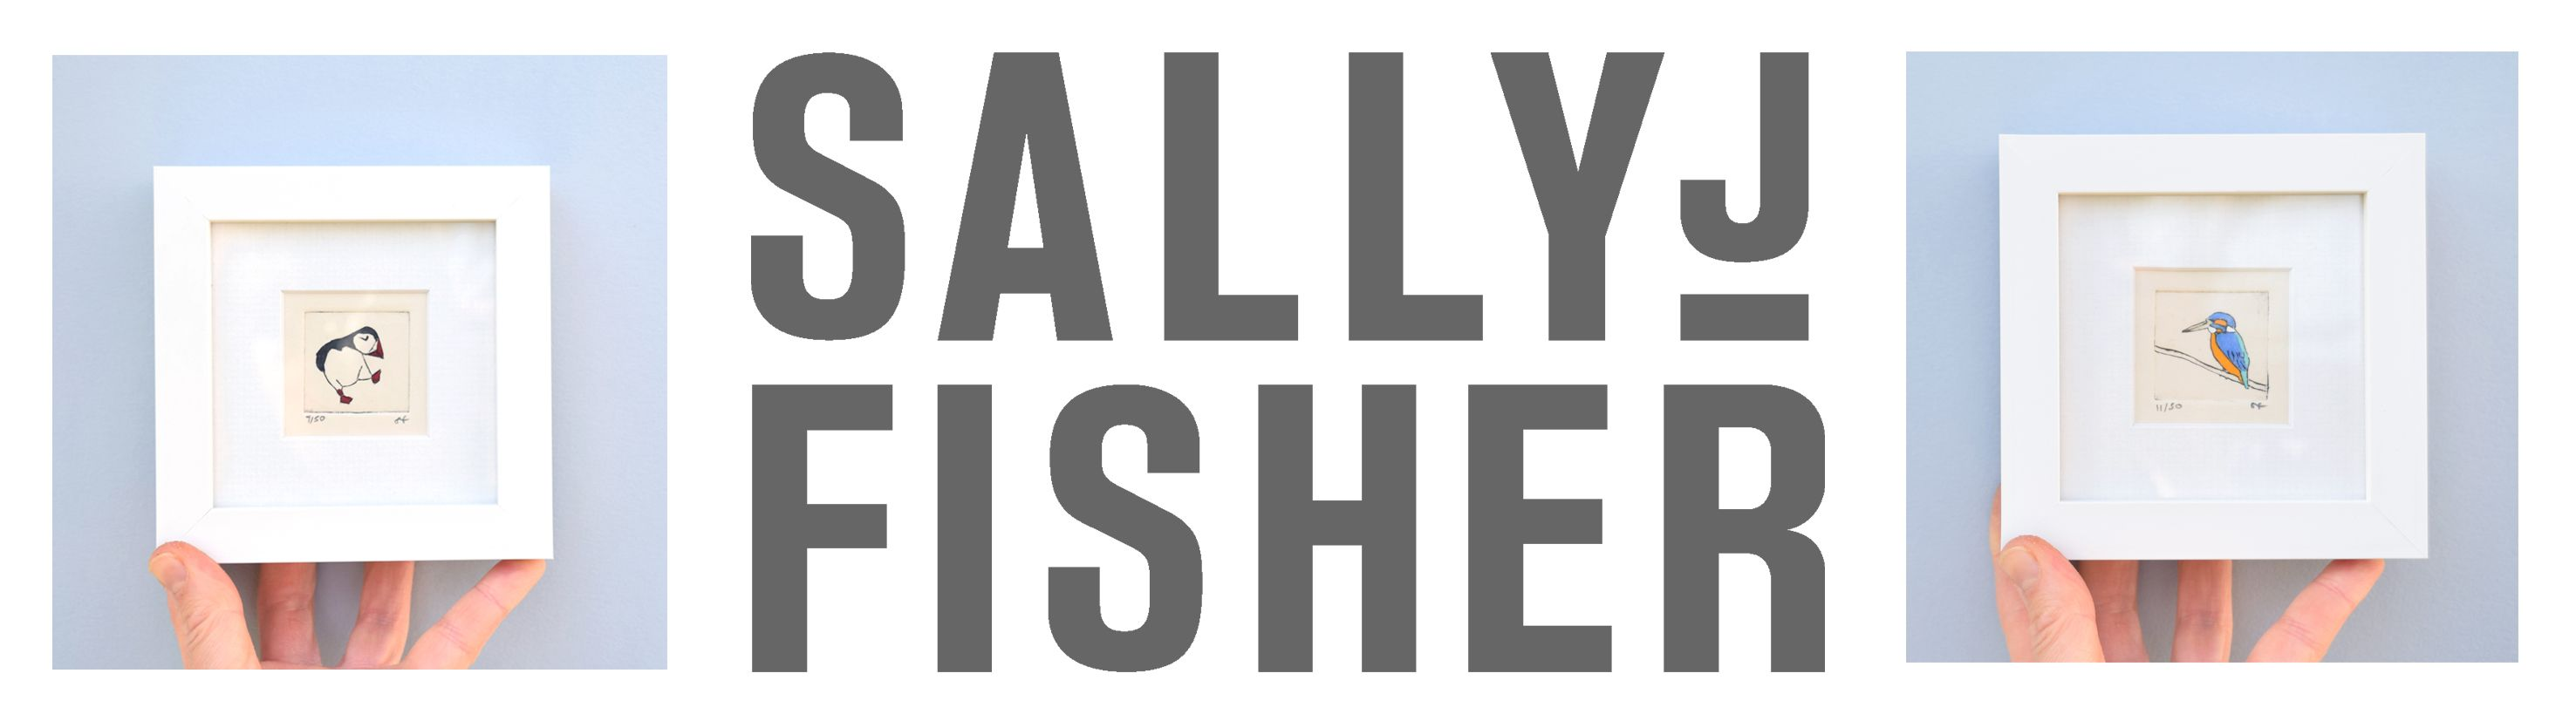 Sally J Fisher